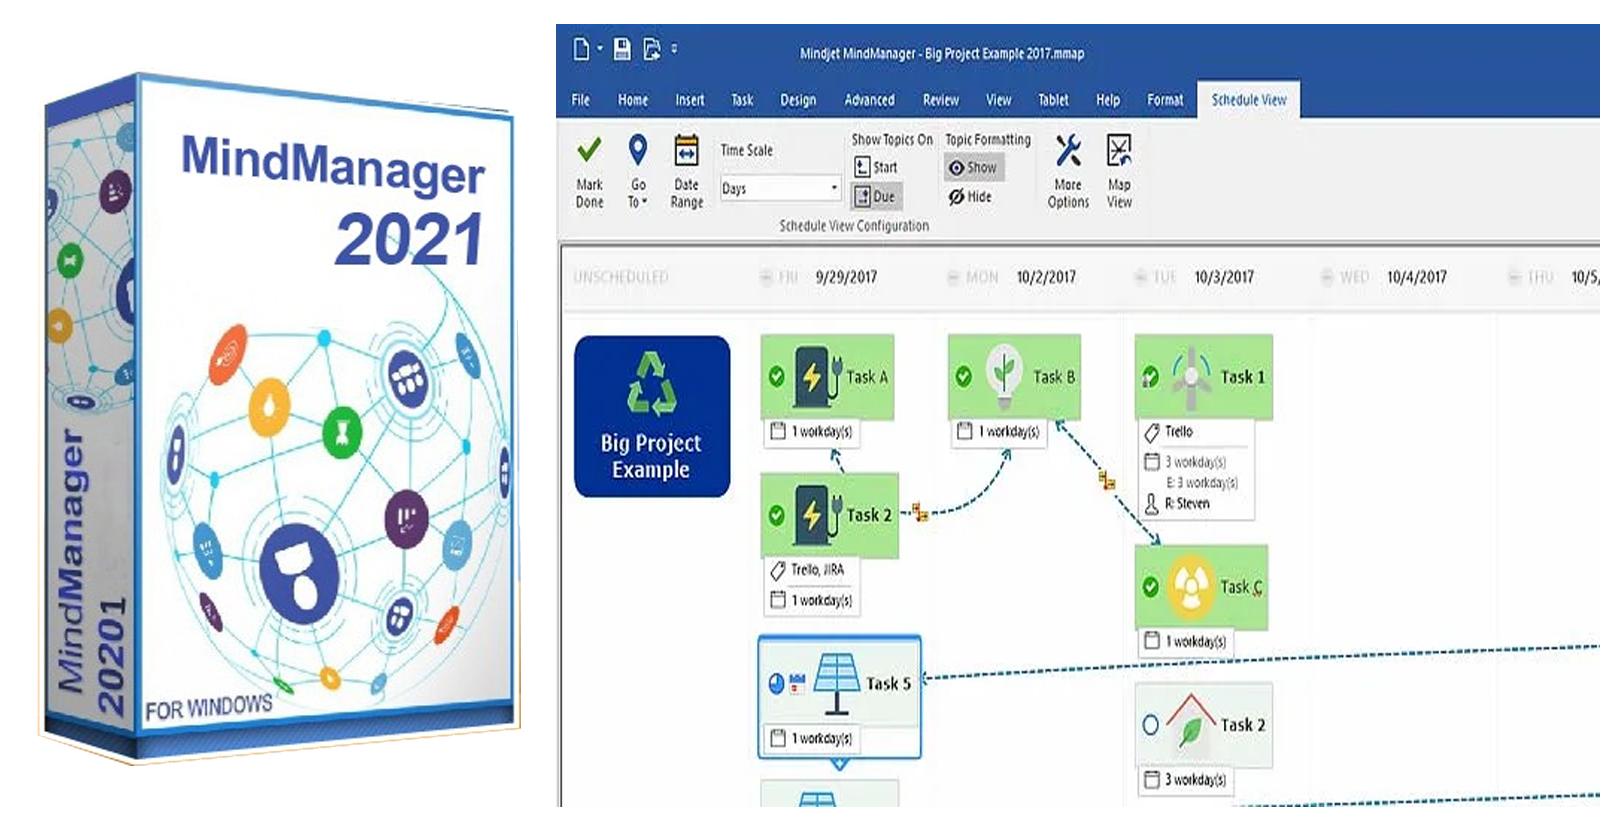 Cara Install Mindjet MindManager 2021 Full Version